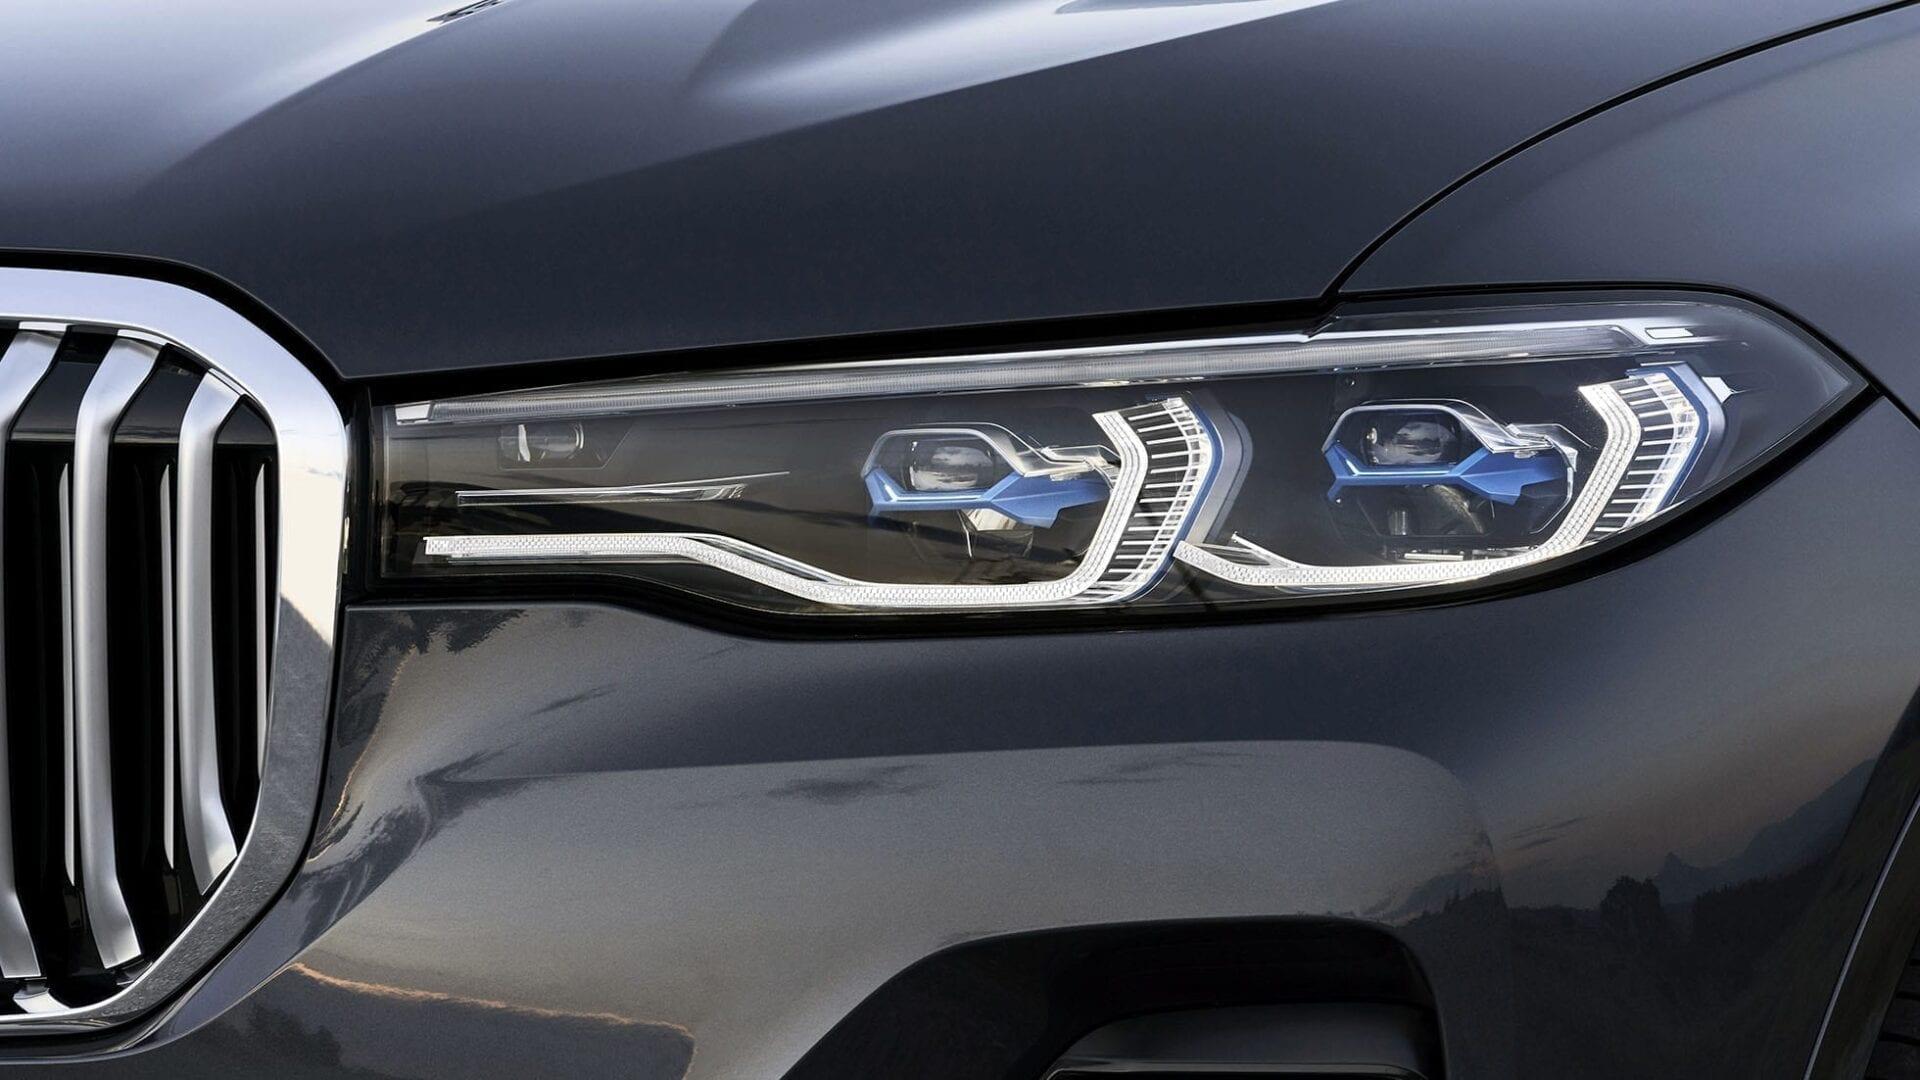 Luces led BMW X7